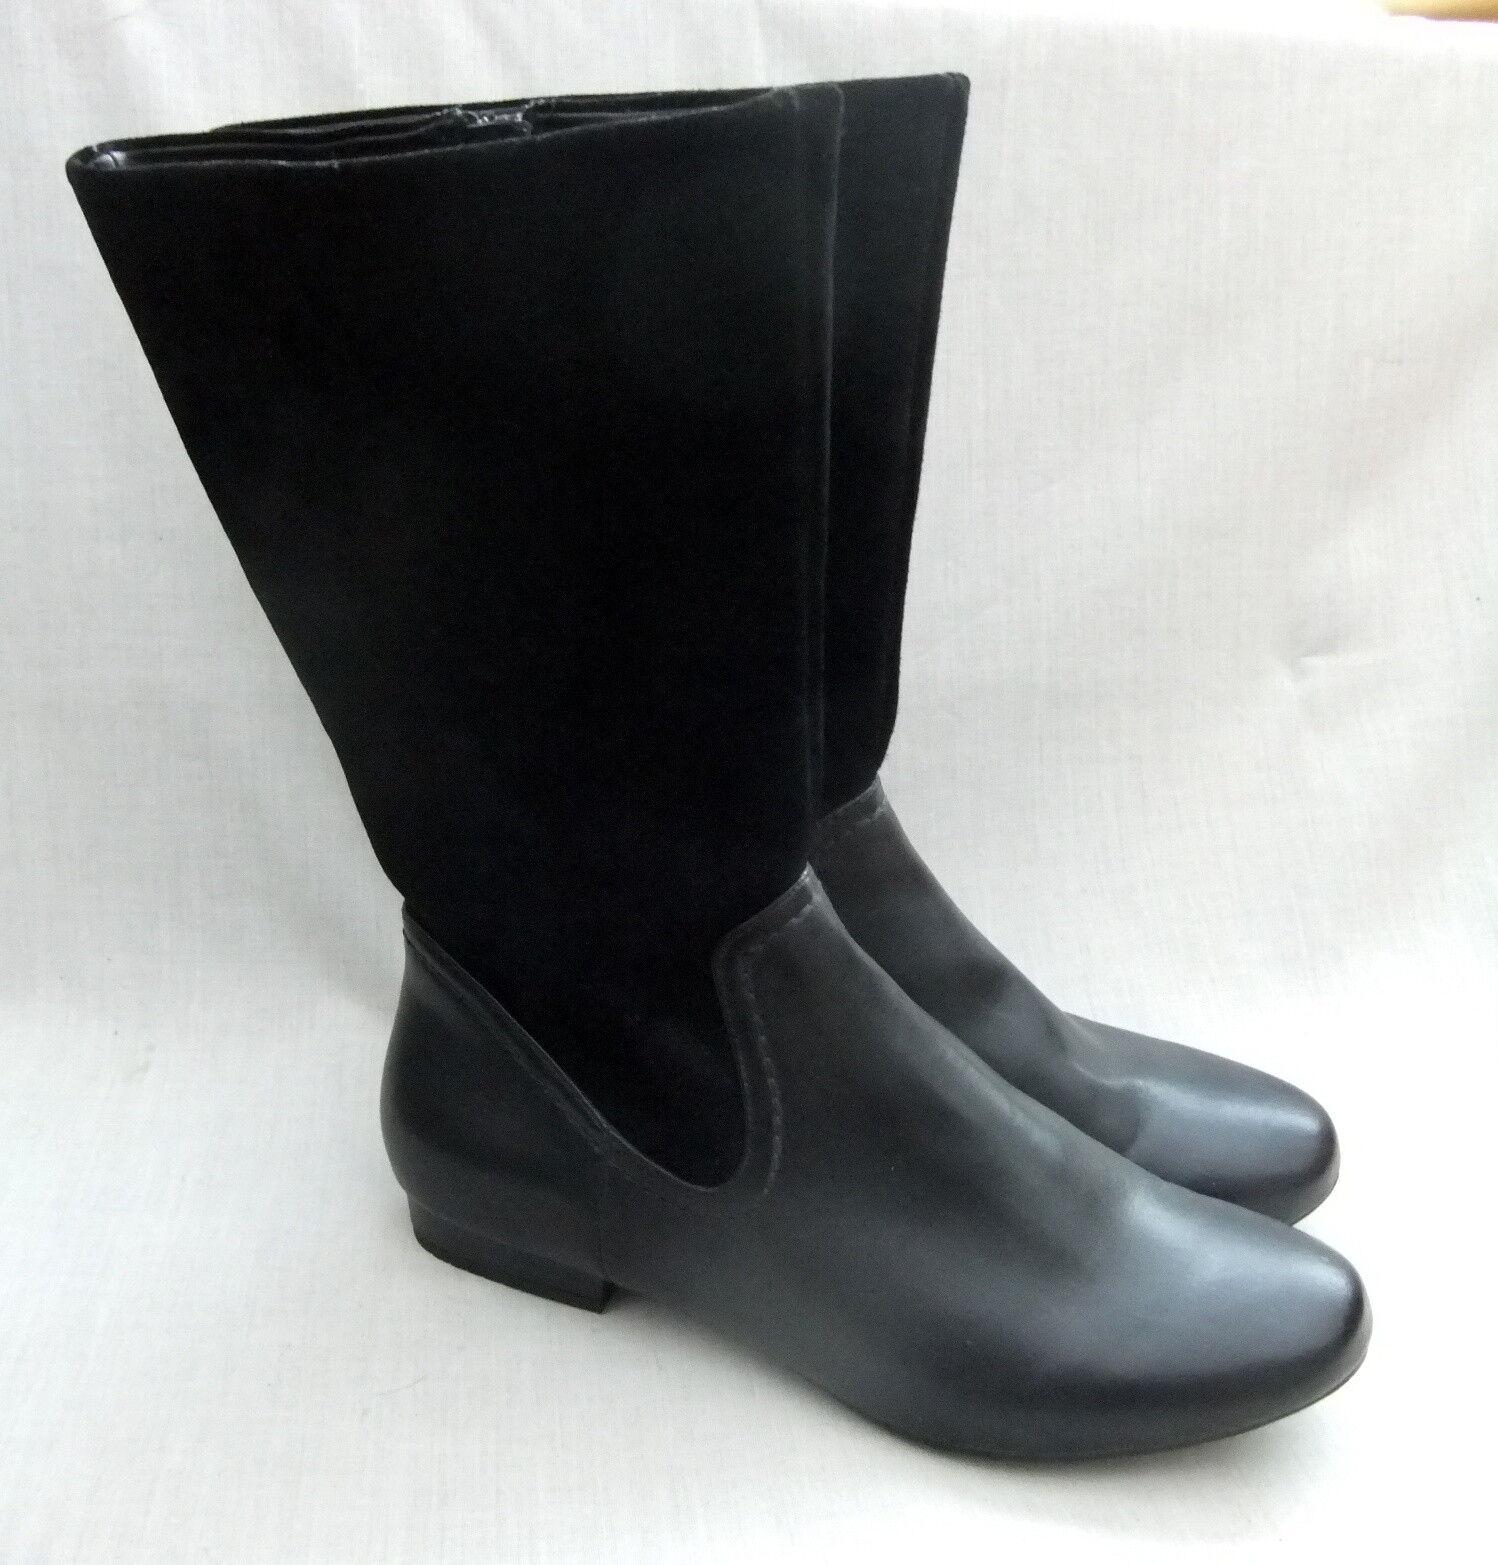 NEW CLARKS MOUNTAIN MIST SUEDE Damenschuhe BLACK LEATHER / SUEDE MIST Stiefel SIZE 7 / 41 845177